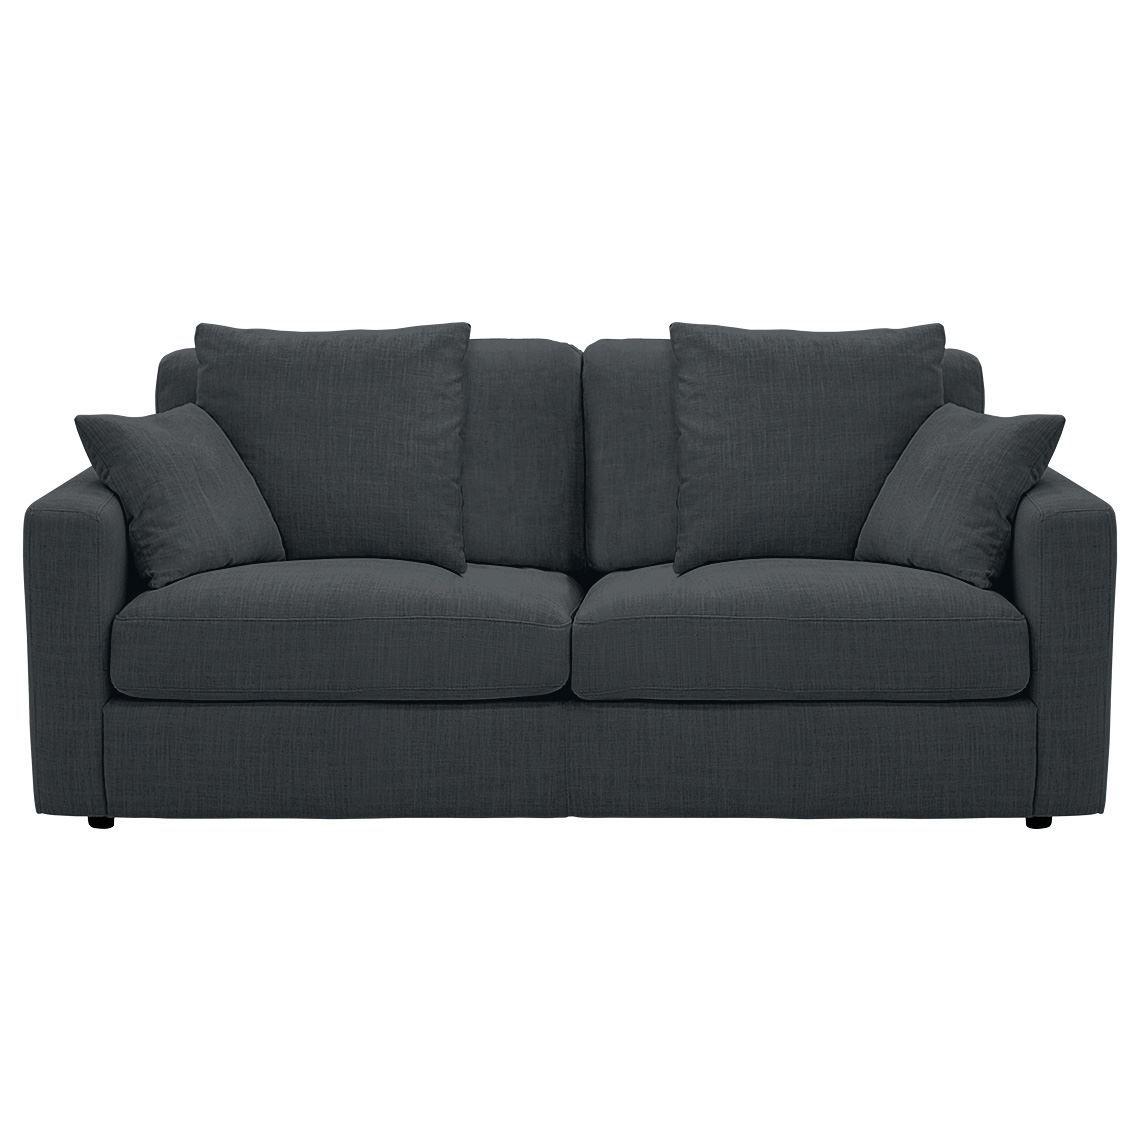 Benson 2 5 Seat Fabric Sofa Coal Fabric Sofa Sofa Seating